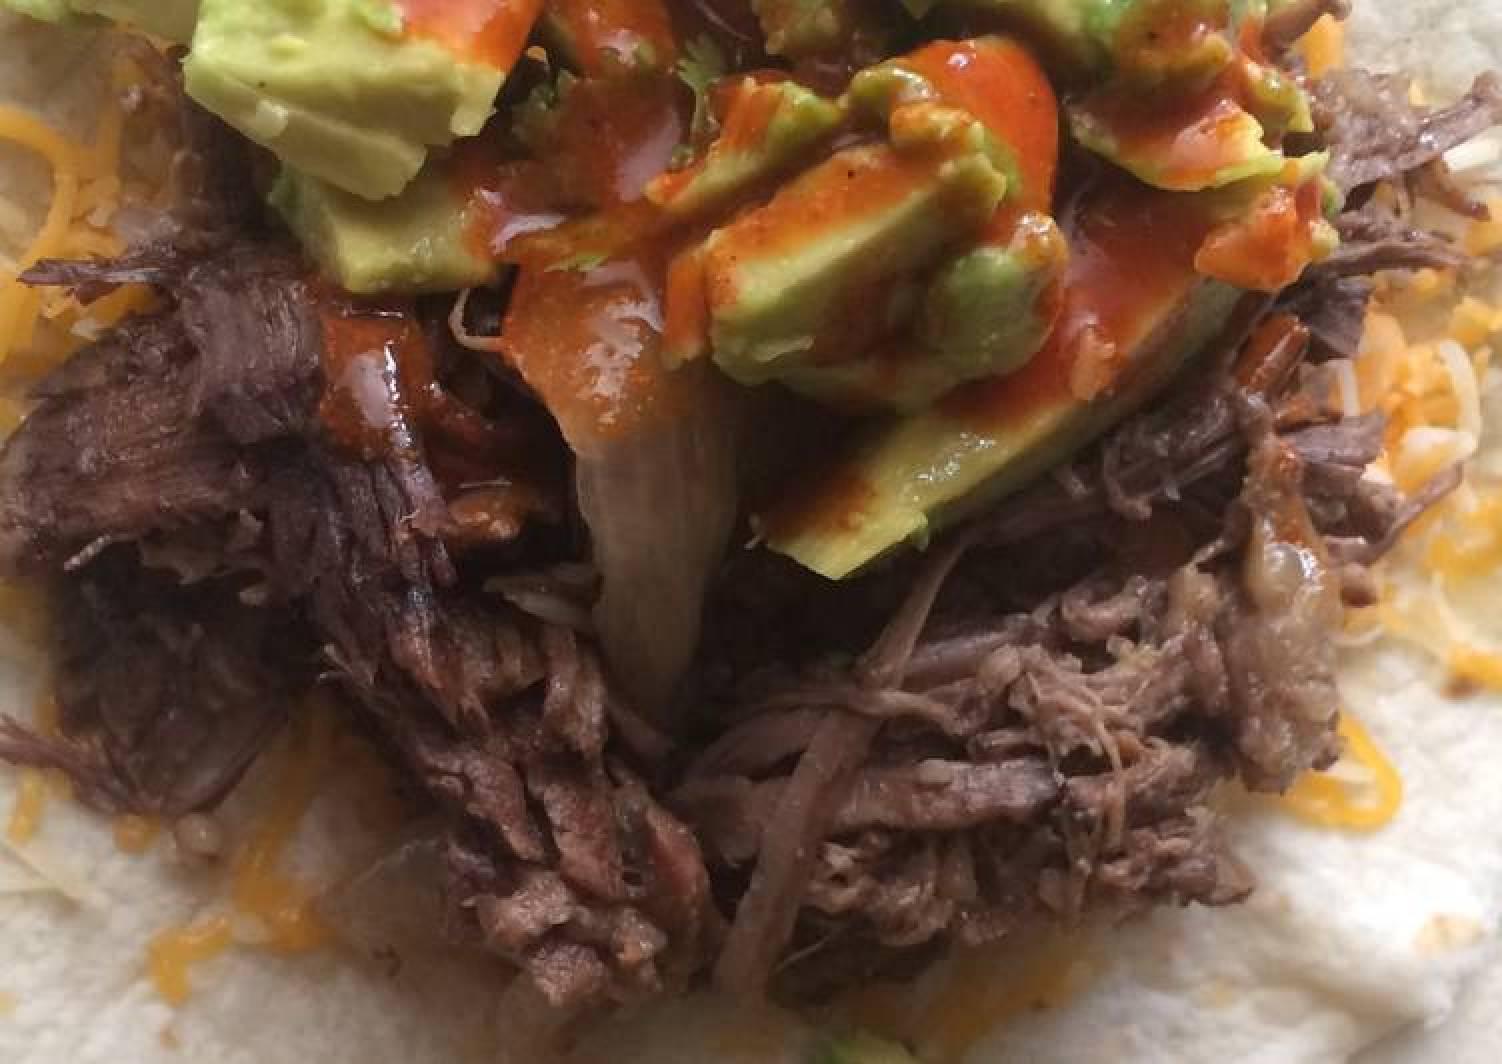 California Shredded Beef And Cheese Burritos